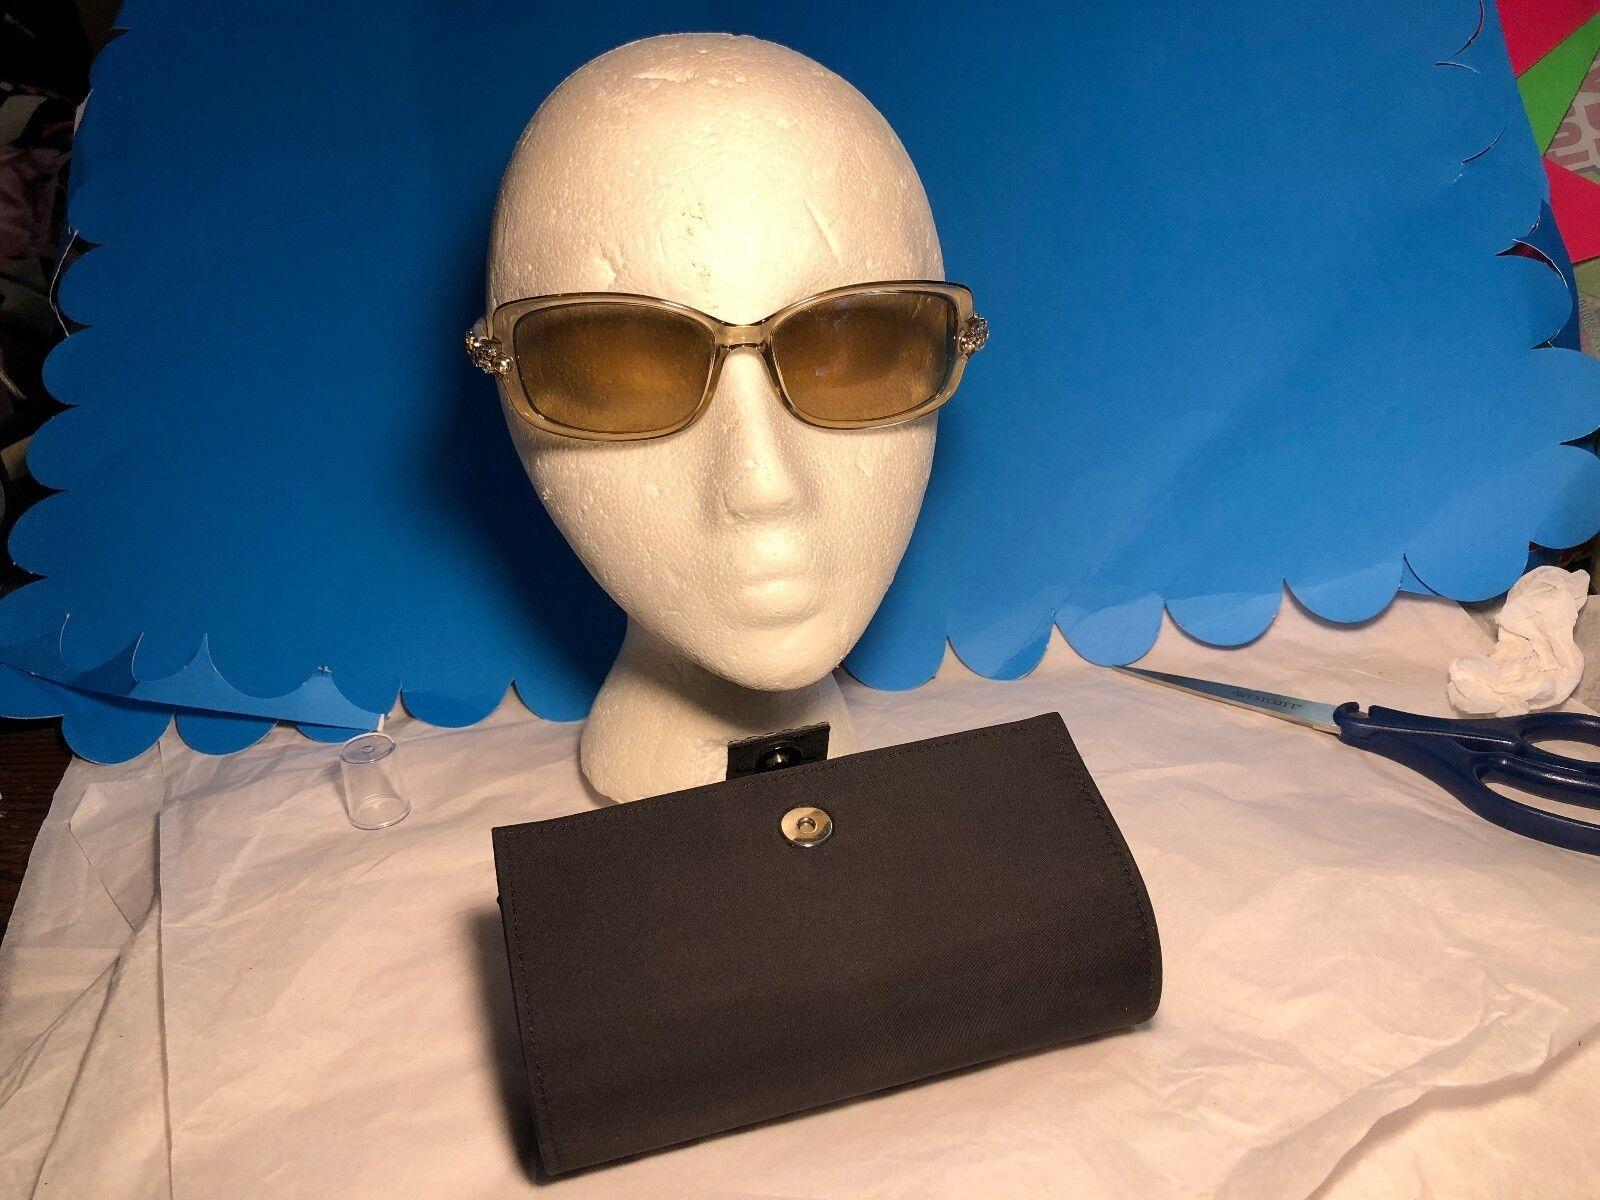 Daniel Swarovski Crystal Women's Sunglasses S628 6052 Khaki Color Stunning look